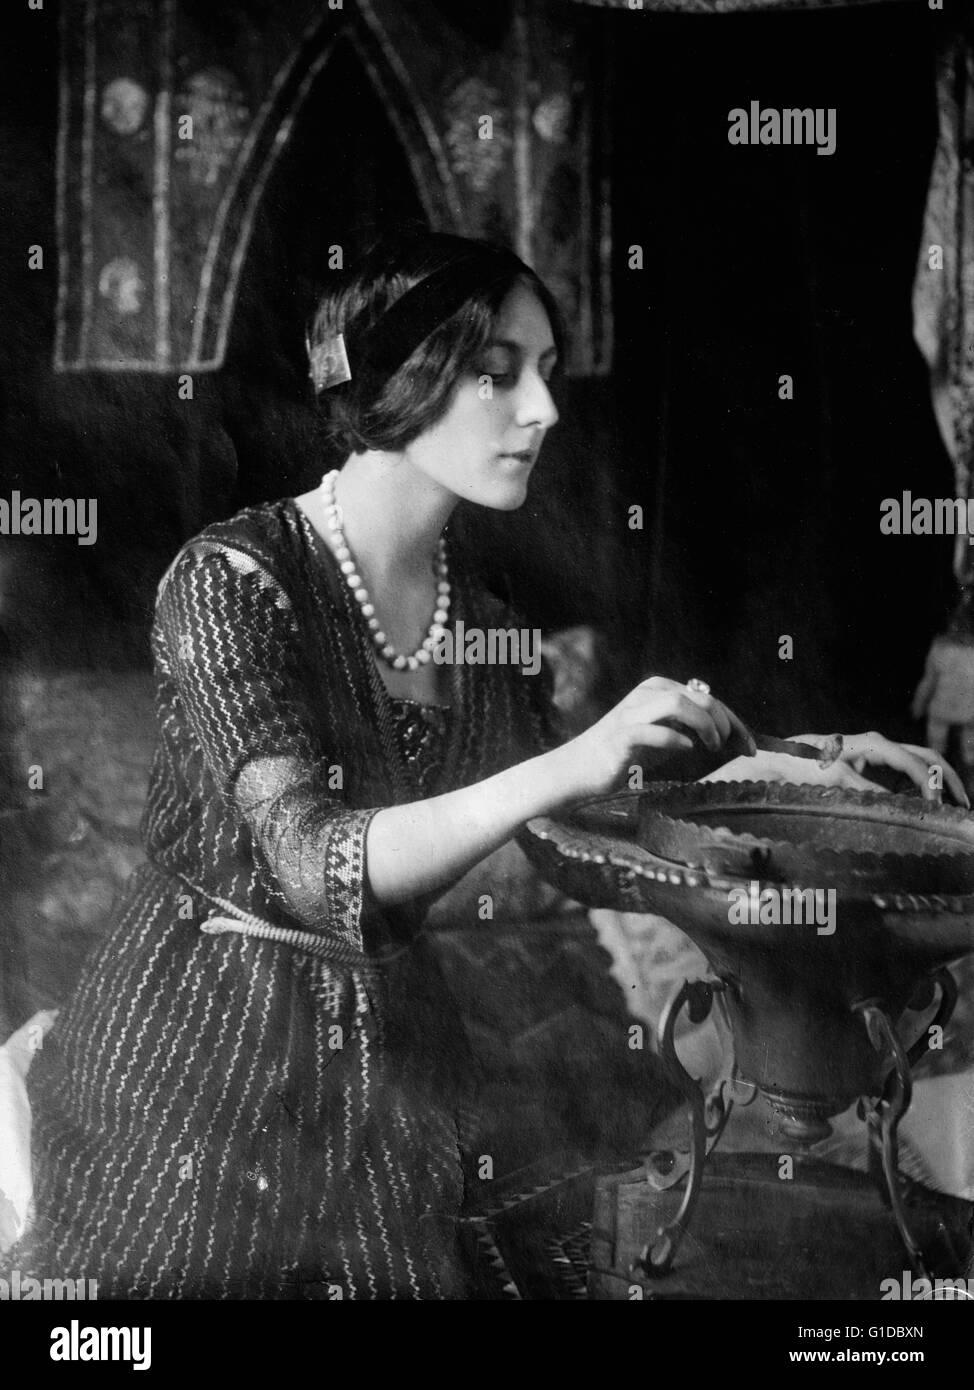 Actress Marina Levtova - biography, personal life and interesting facts 30